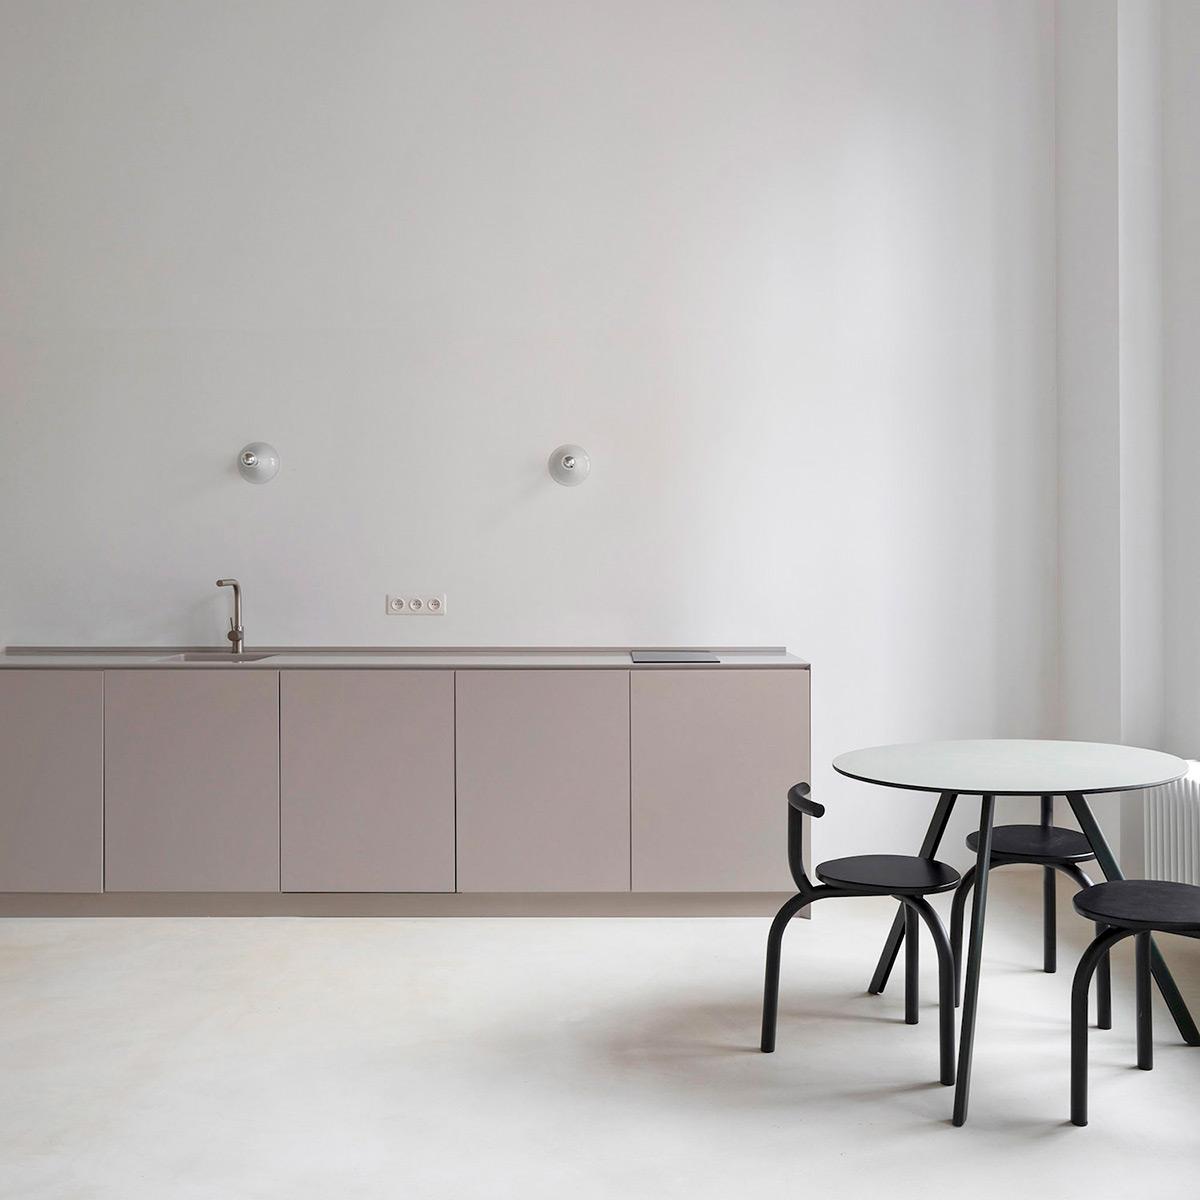 A-PLACE-Thisispaper-Studio-Maja-Wirkus-01